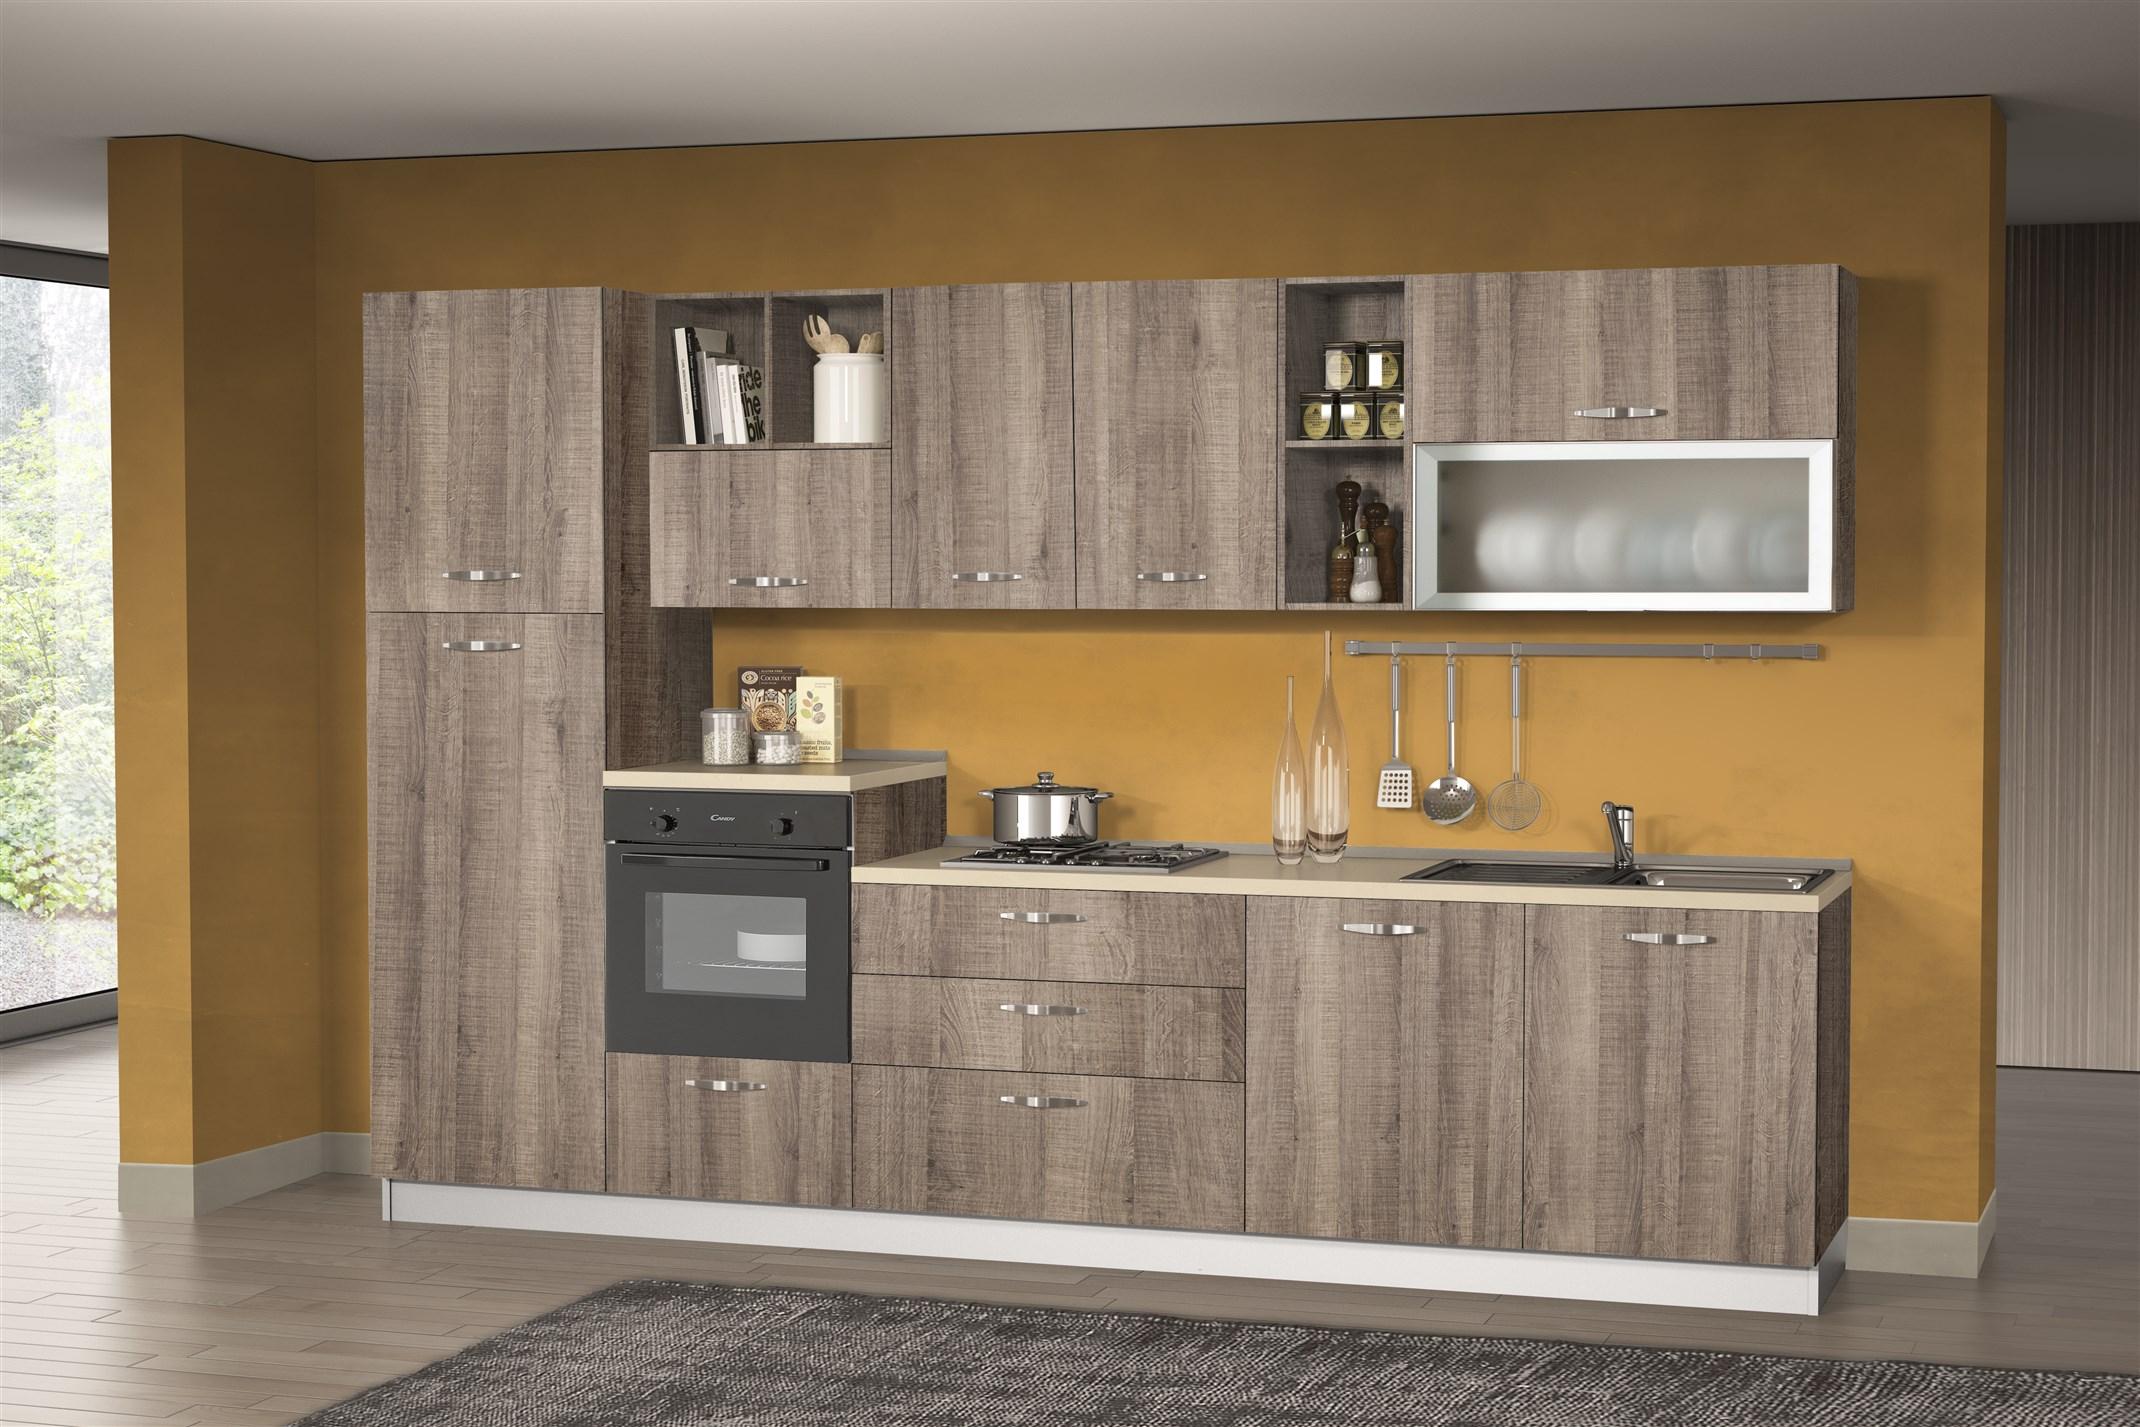 Cucina Antares 330 con lavastoviglie